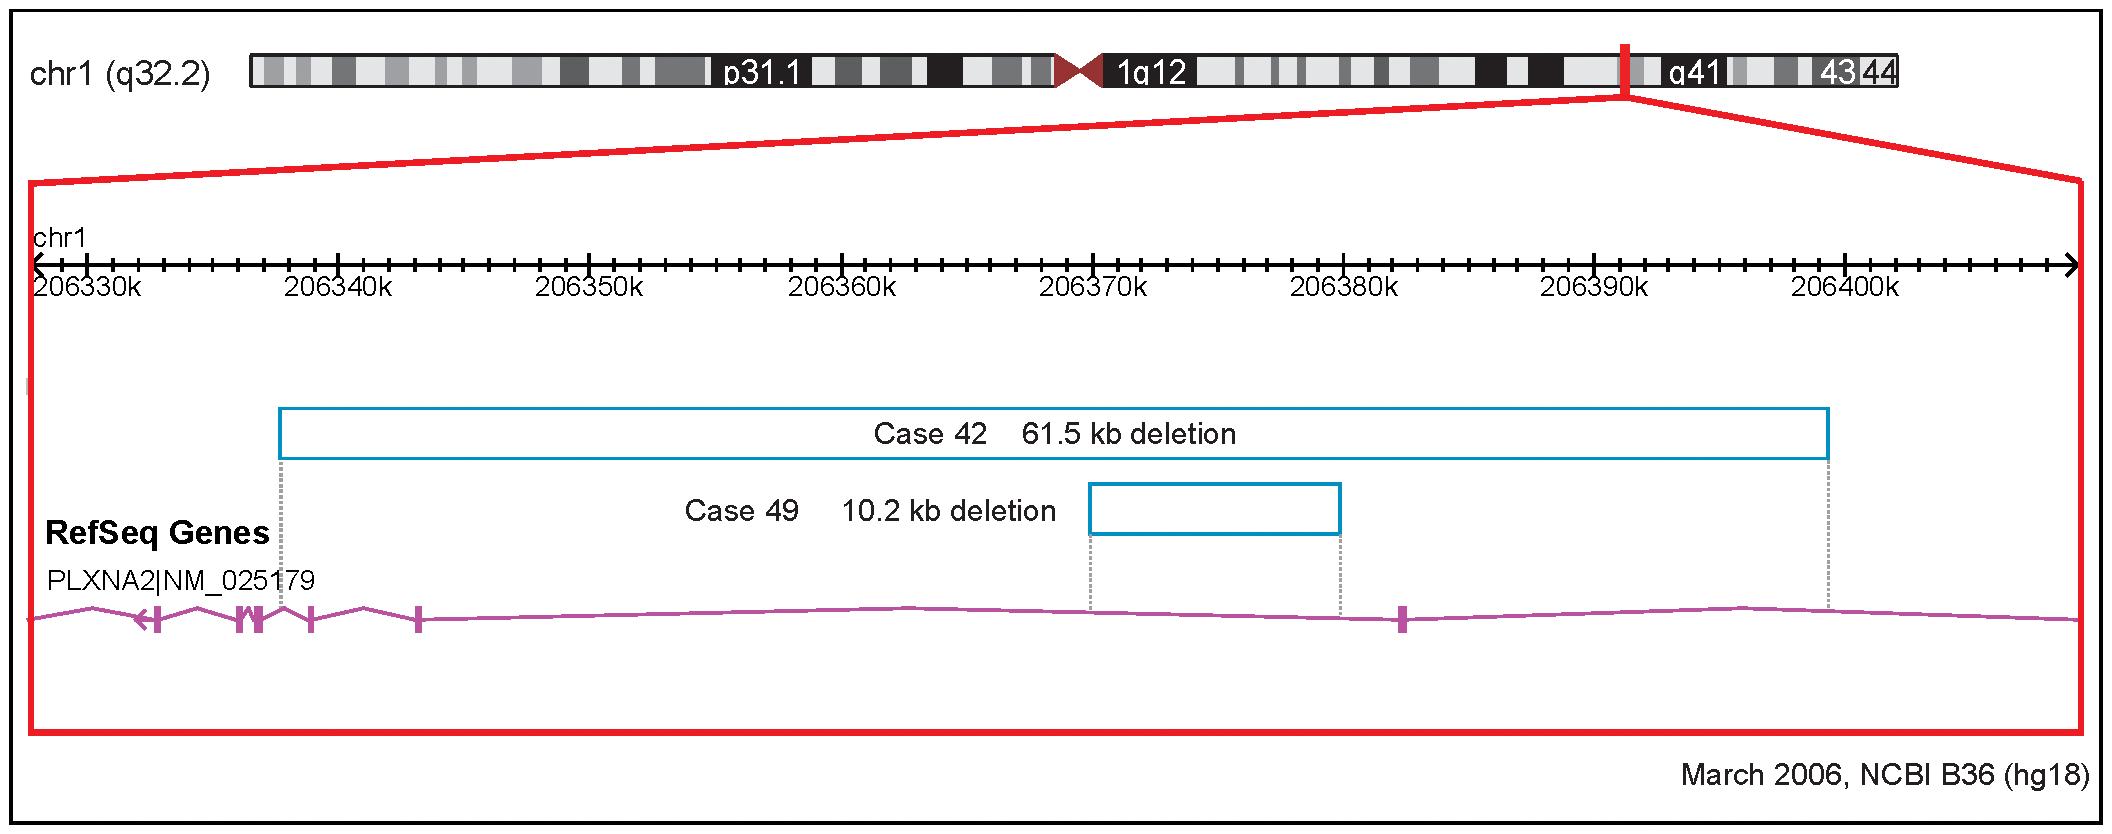 Rare CNVs overlapping novel candidate gene for tetralogy of Fallot: PLXNA2.